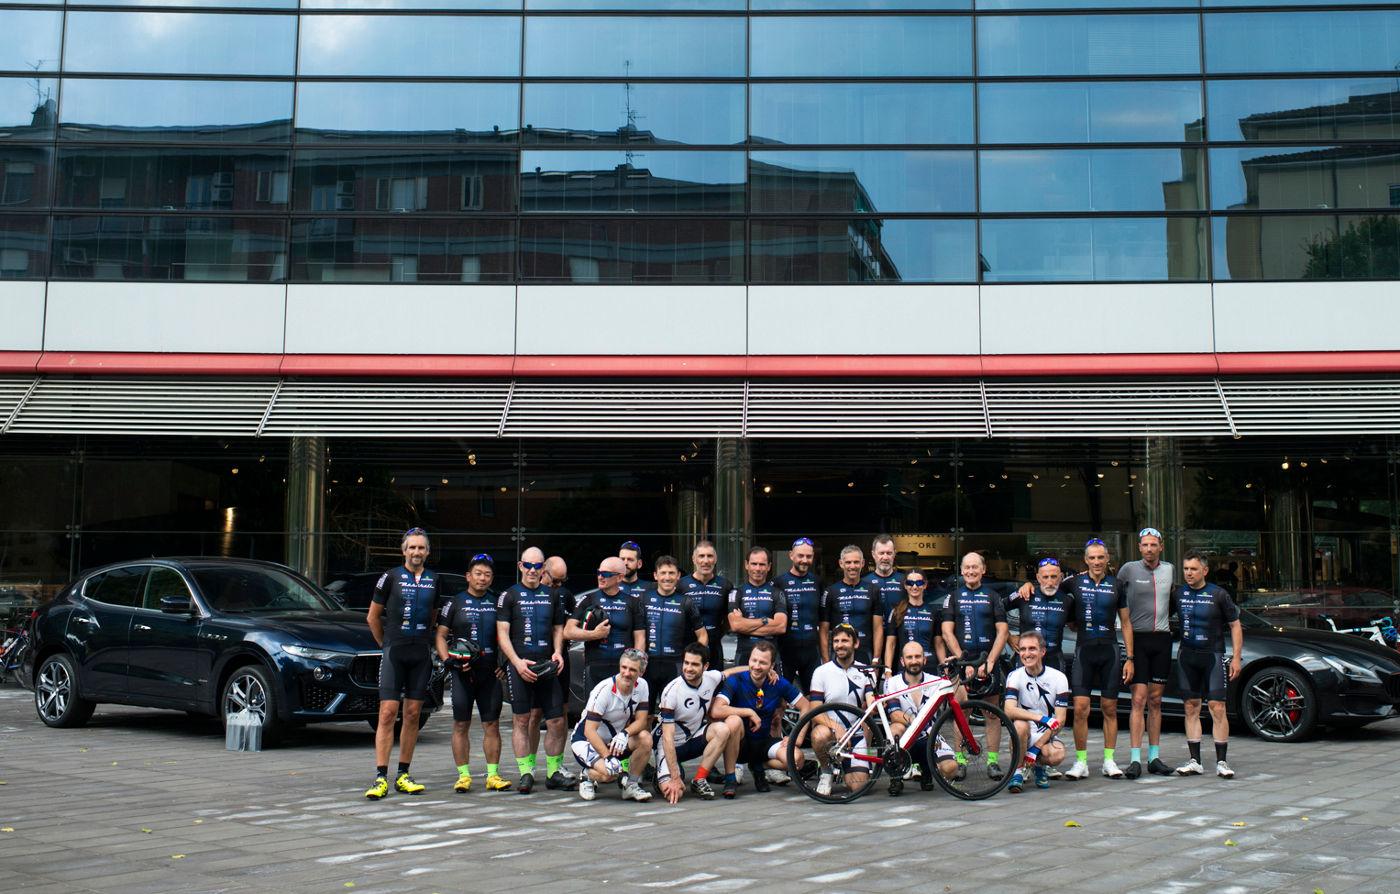 Paris Modena Radtour 2019